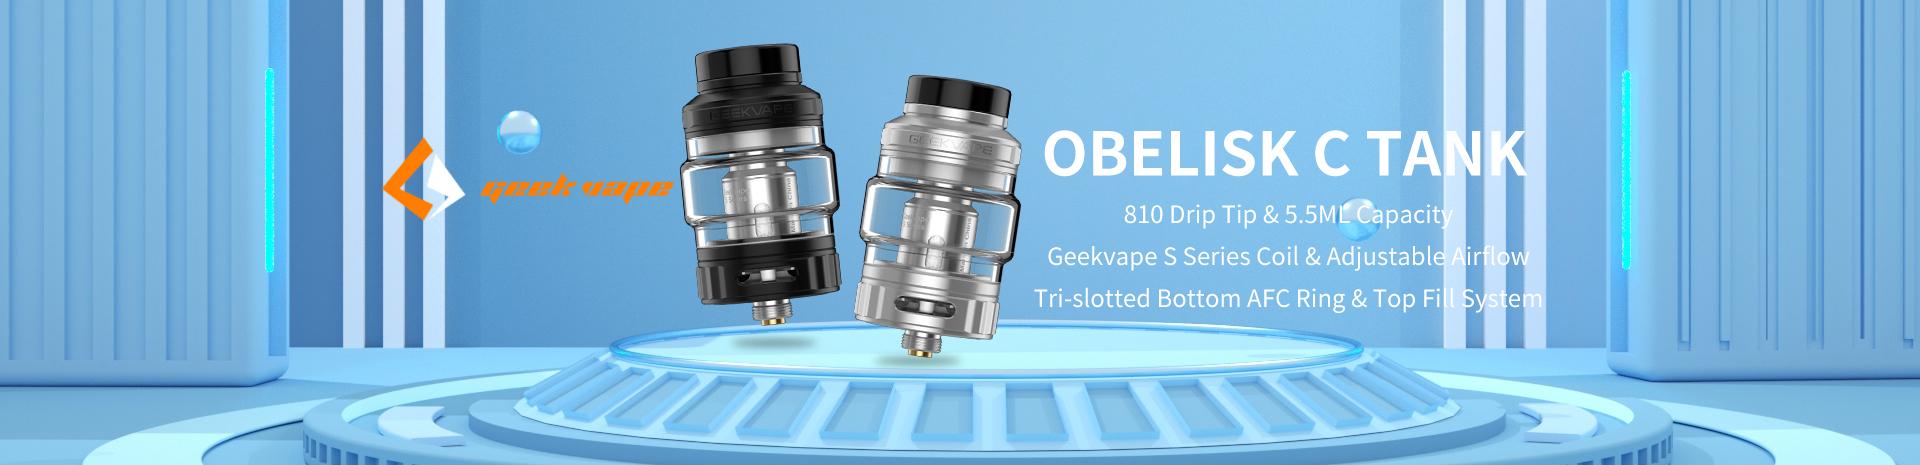 GeekVape Obelisk C Cerberus Tank Banner